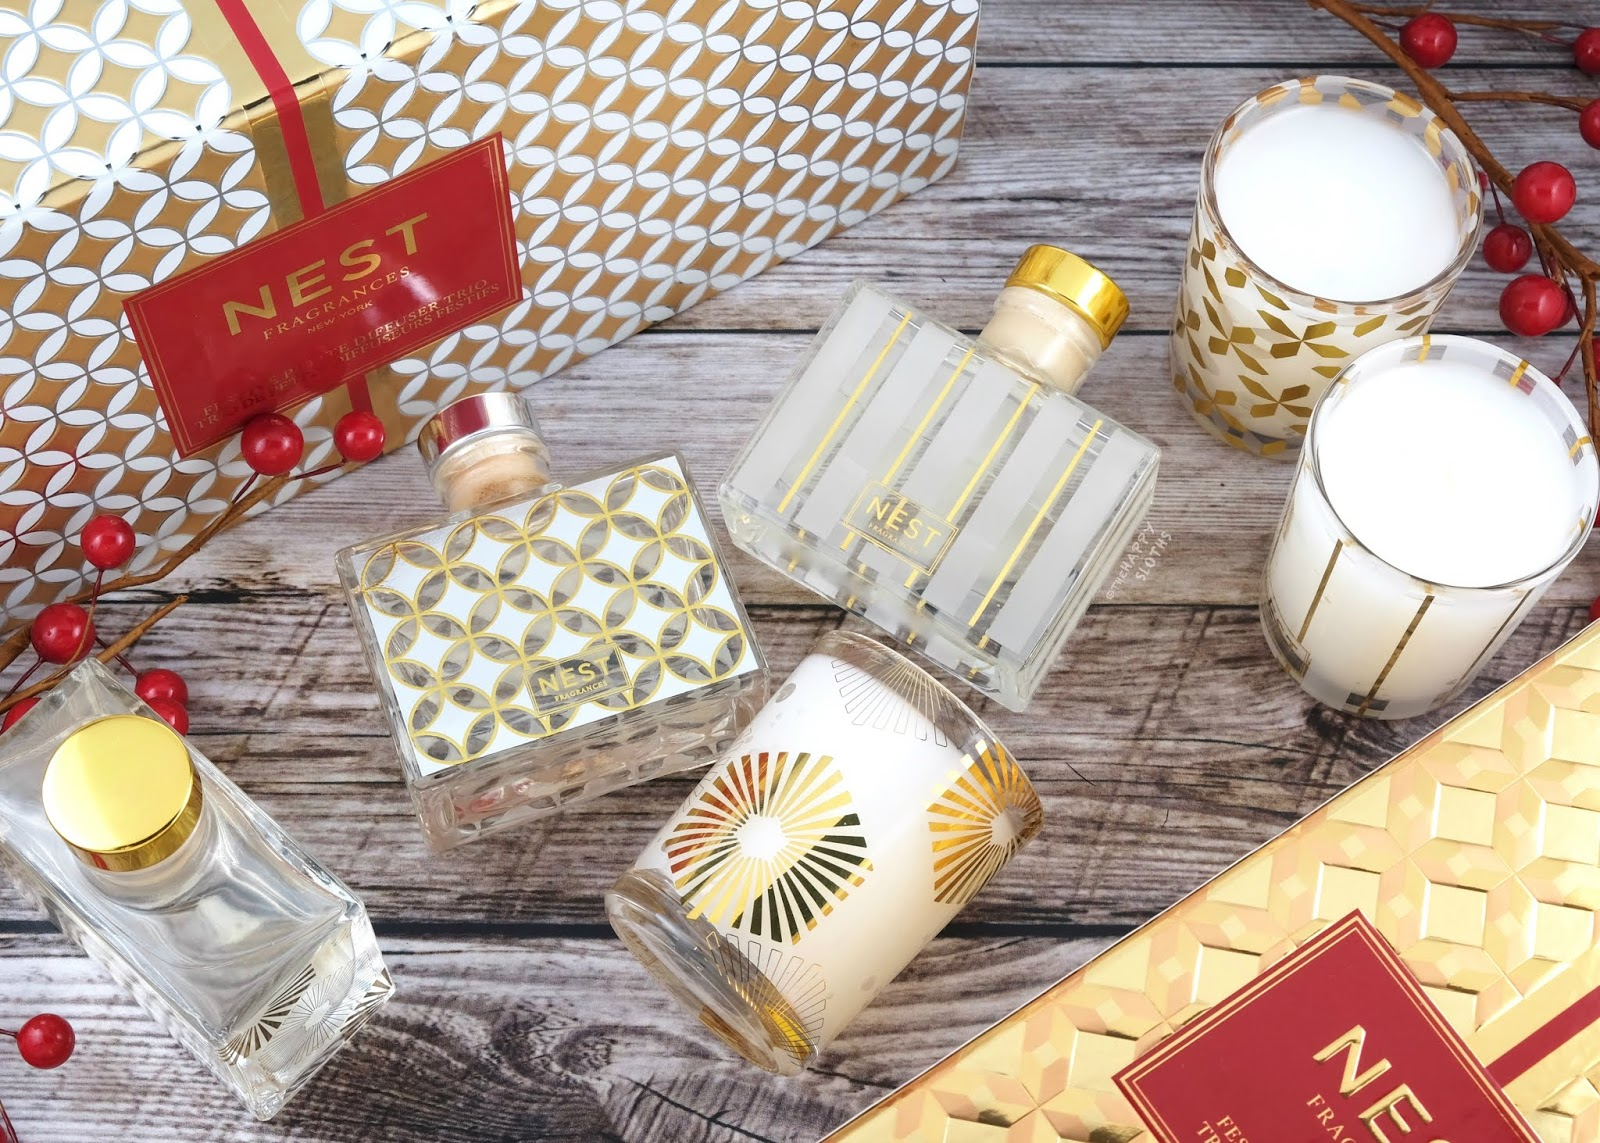 NEST Fragrances | Holiday 2019 Festive Votive Trio & Festive Petite Diffuser Trio: Gift Guide